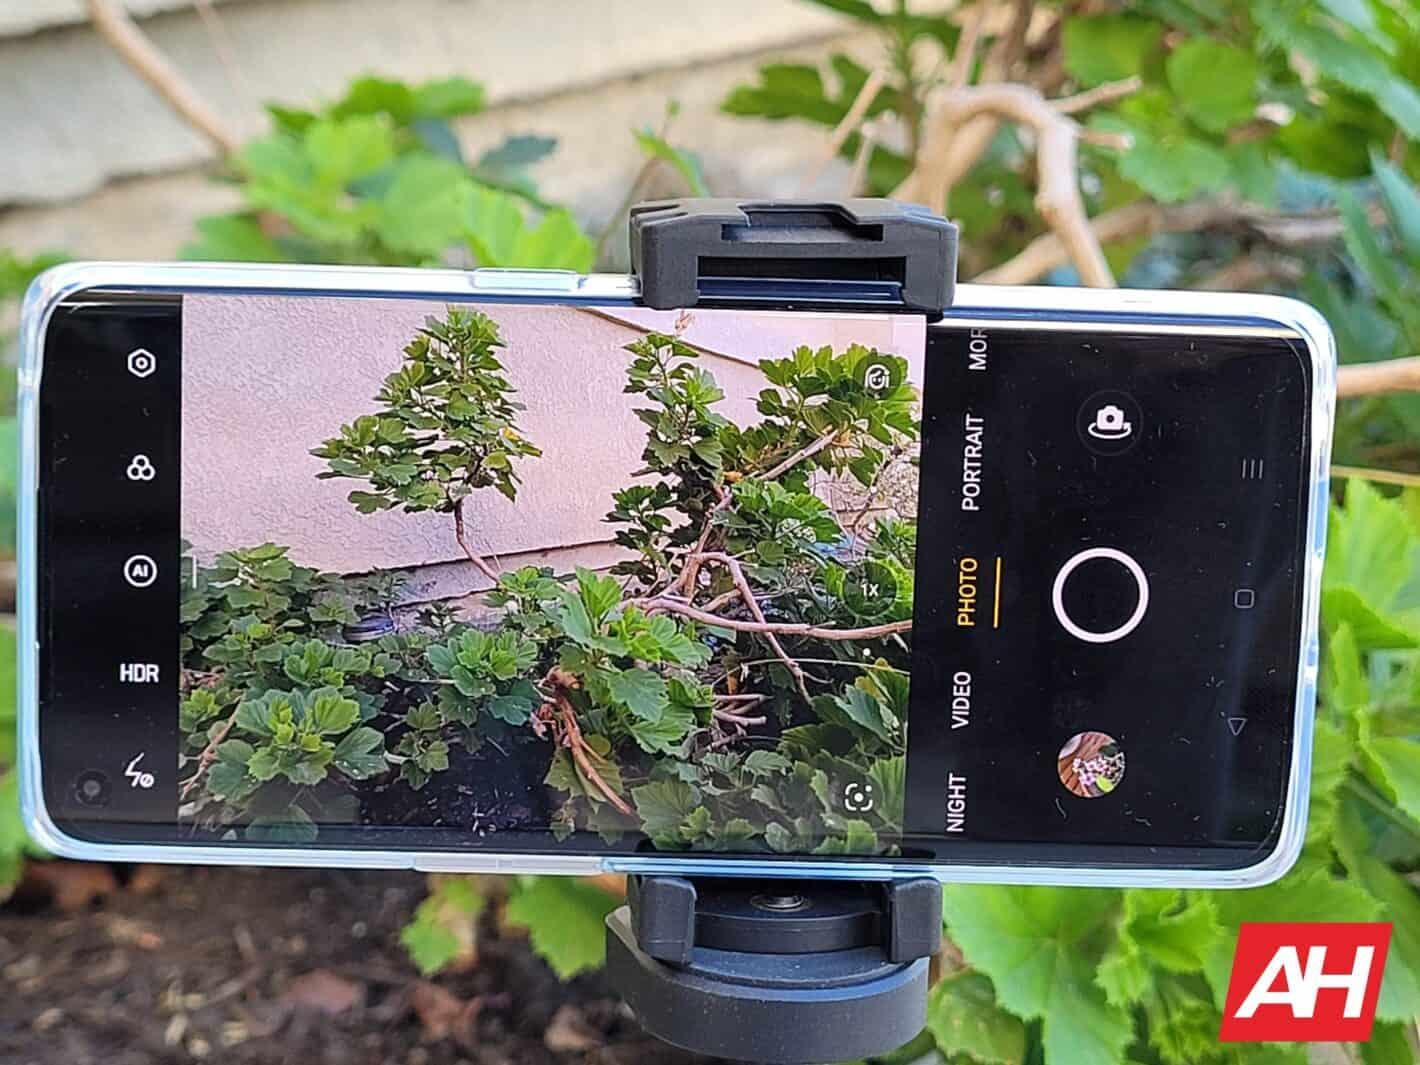 Oppo Reno5 Pro 5G AH HR Camera